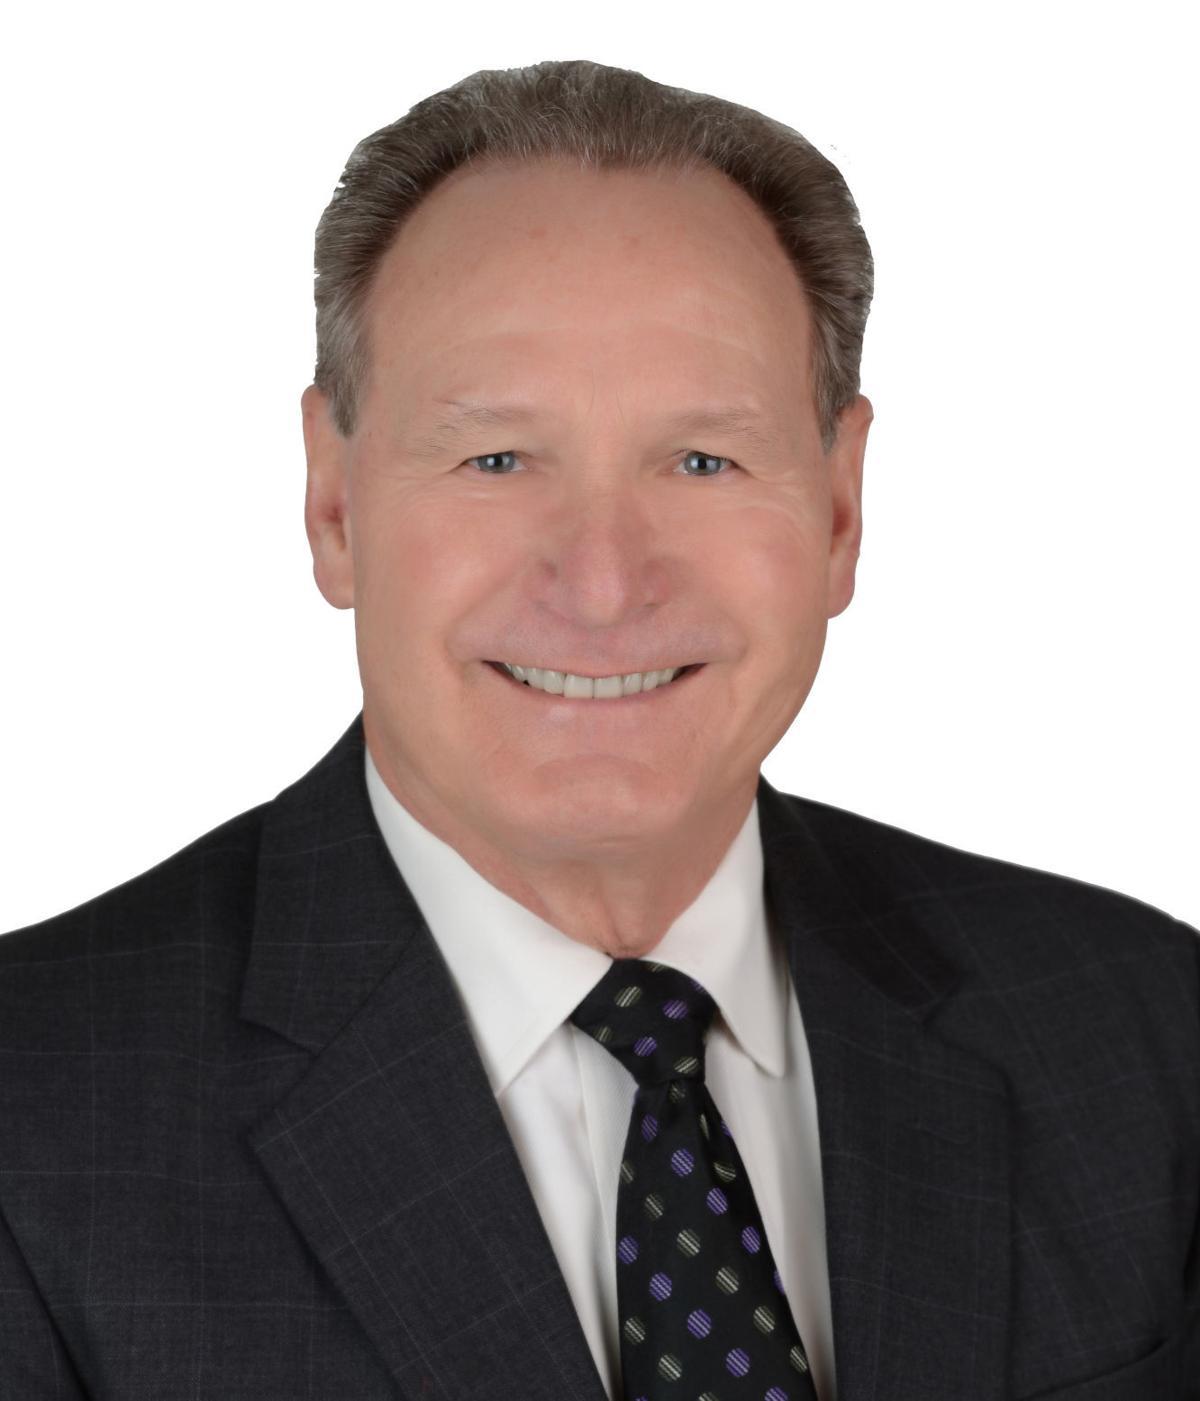 Mike Borschuk